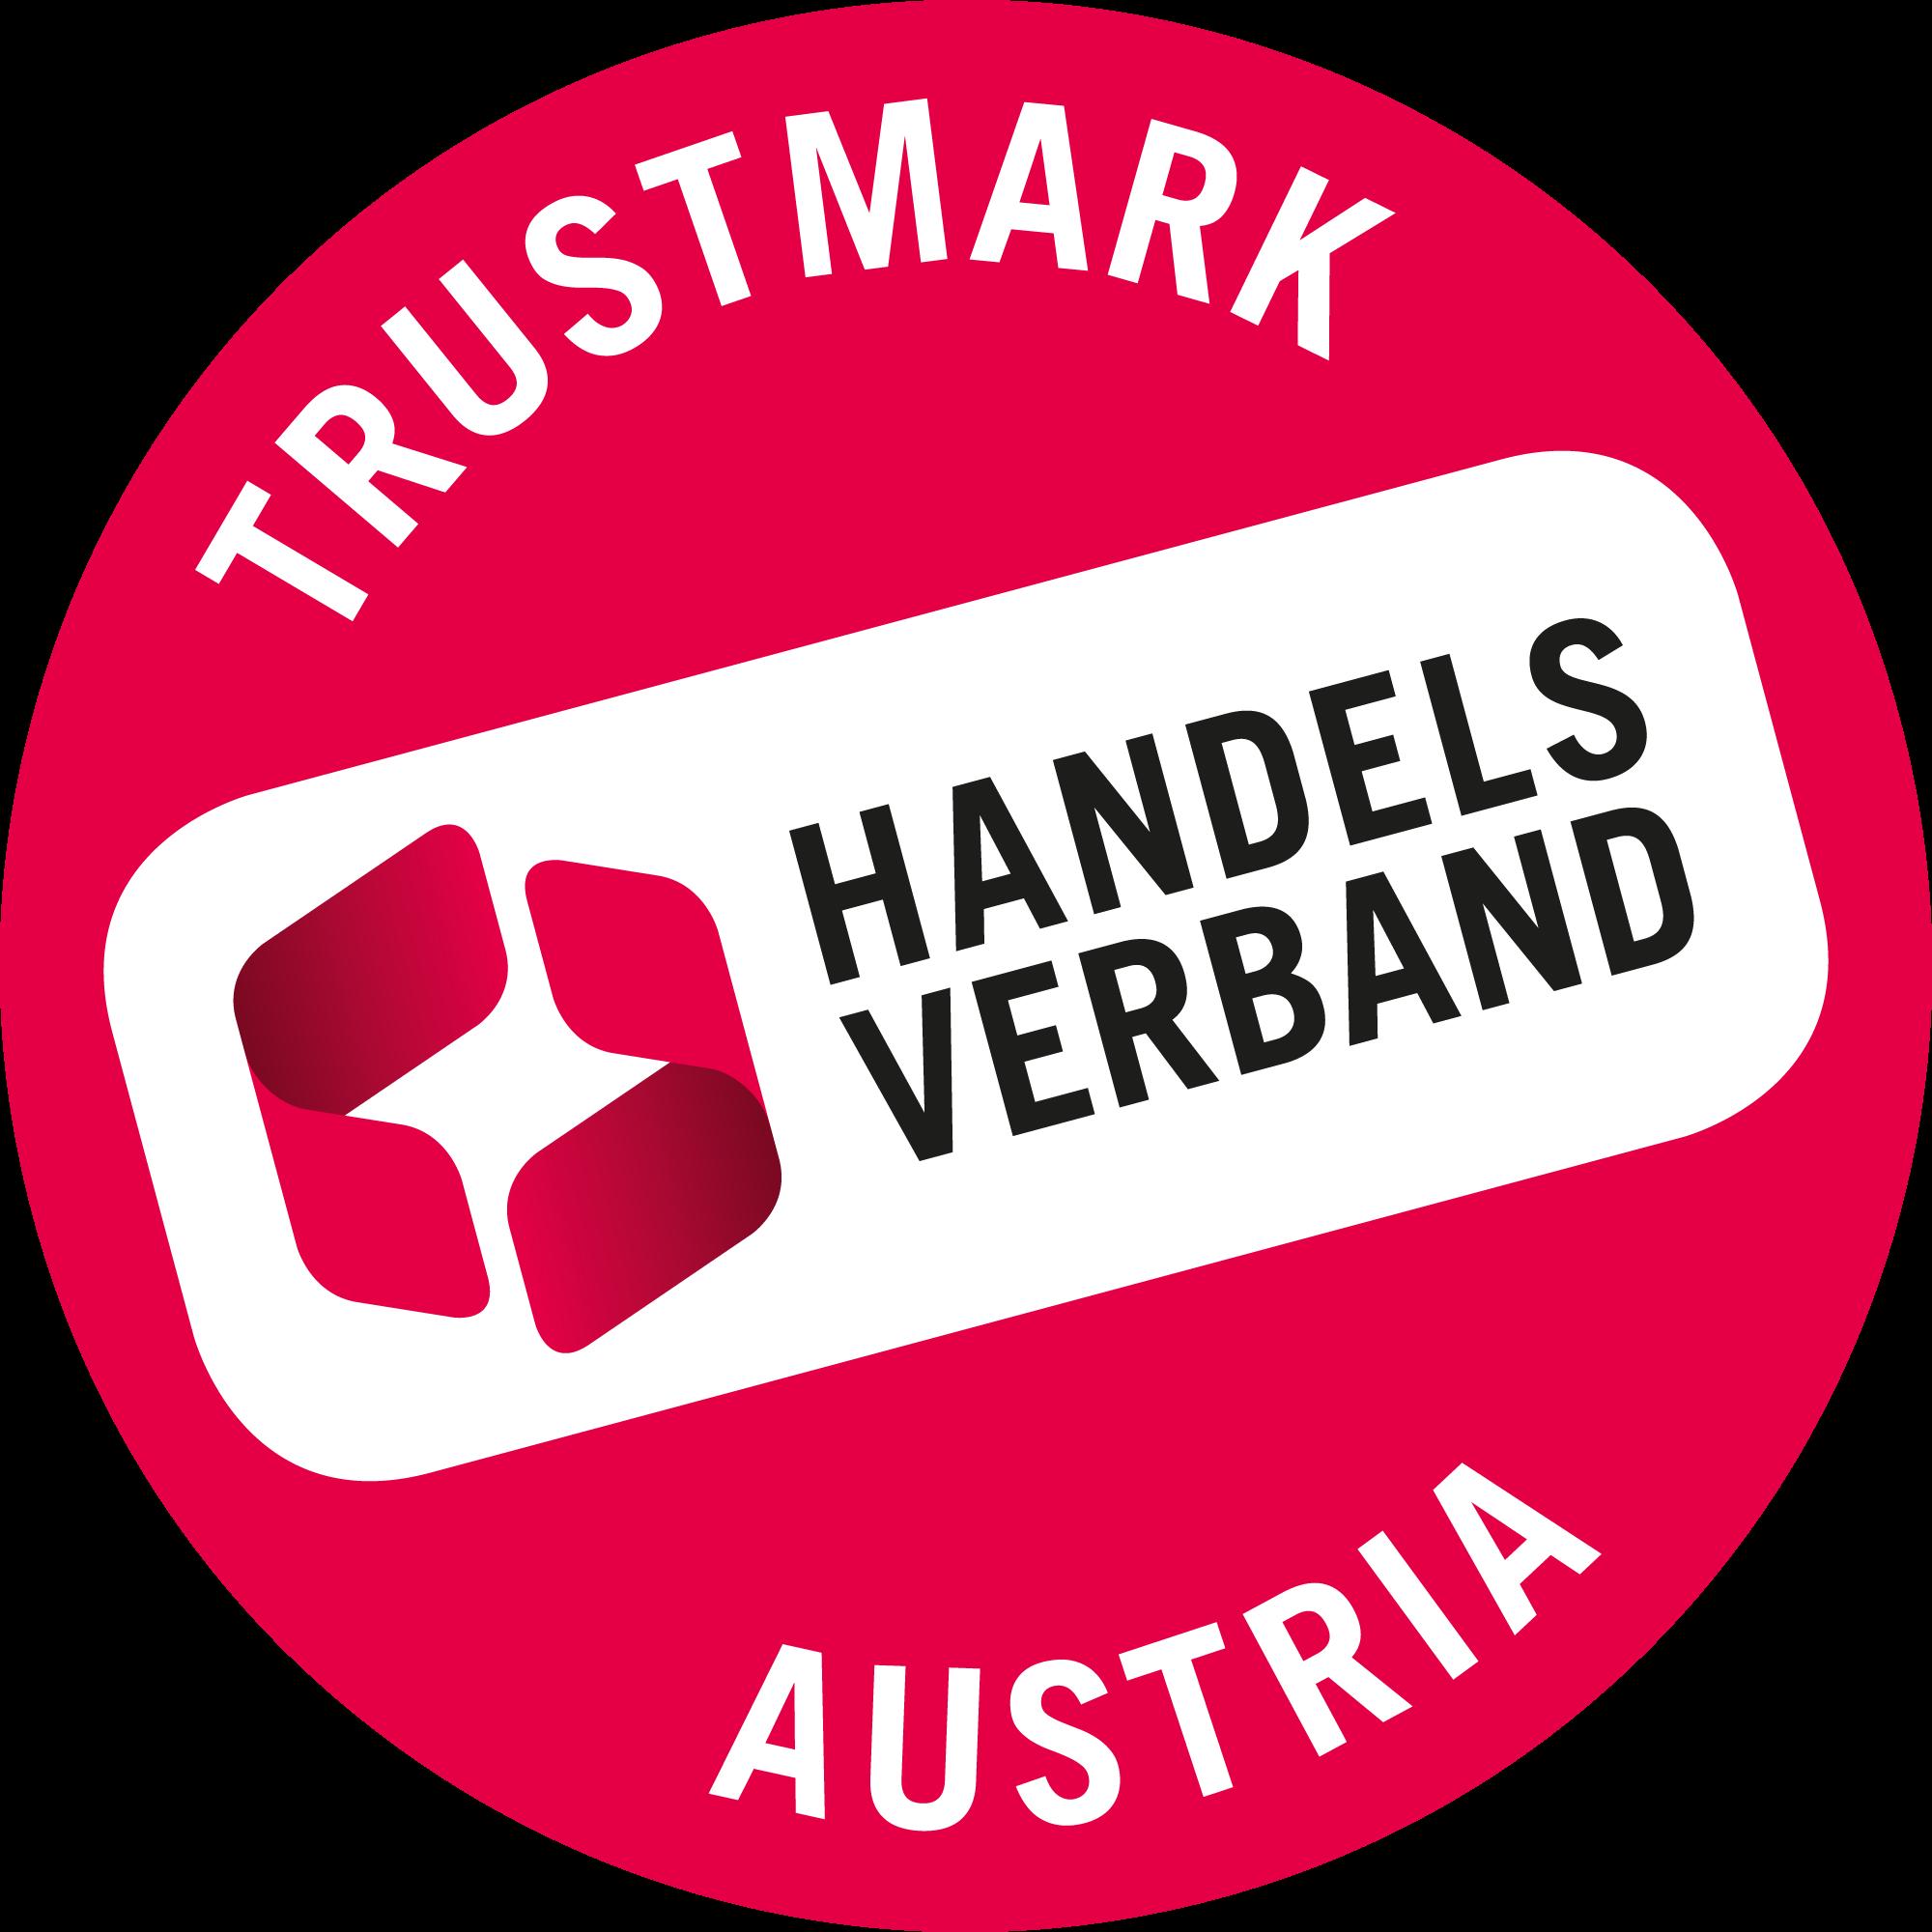 Trustmark Austria